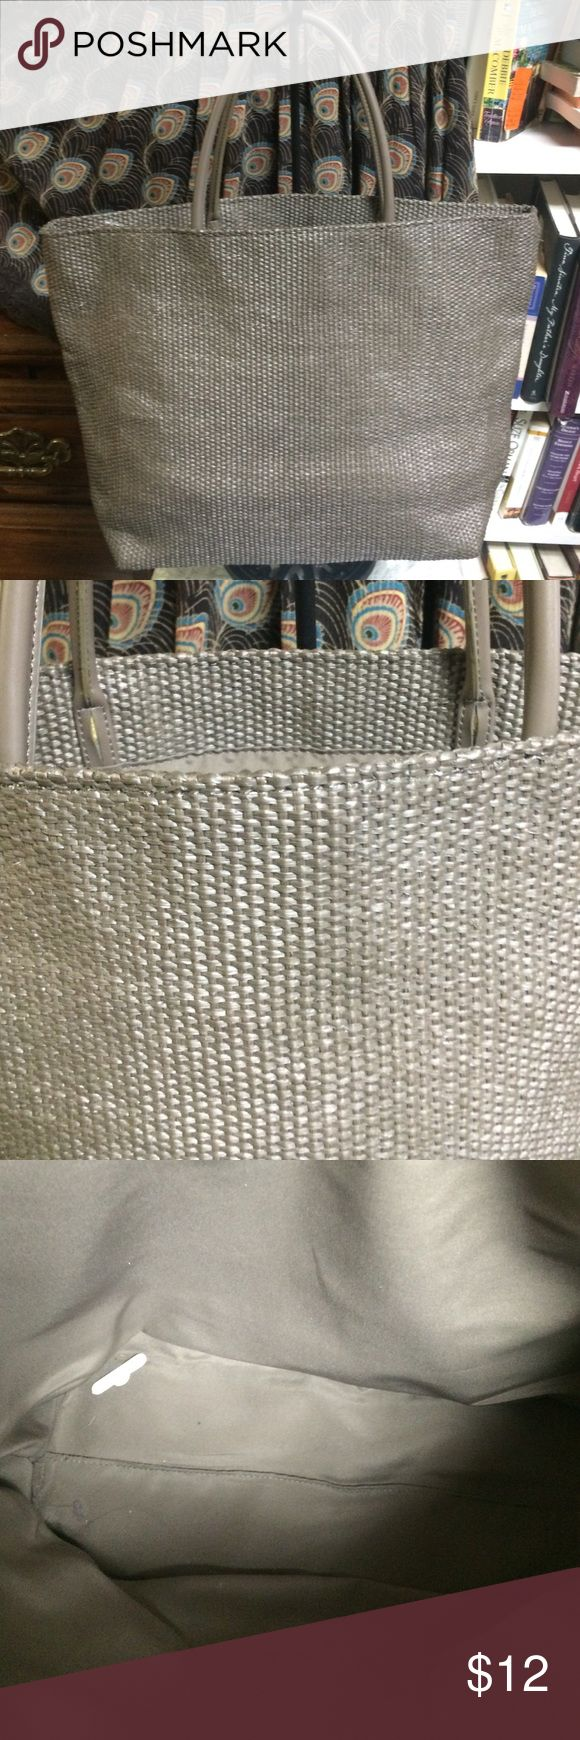 "NWOT Gap Handbag Gap tote Handbag taupe color 17"" wide 12"" depth 6"" double strap Gap Bags Totes"